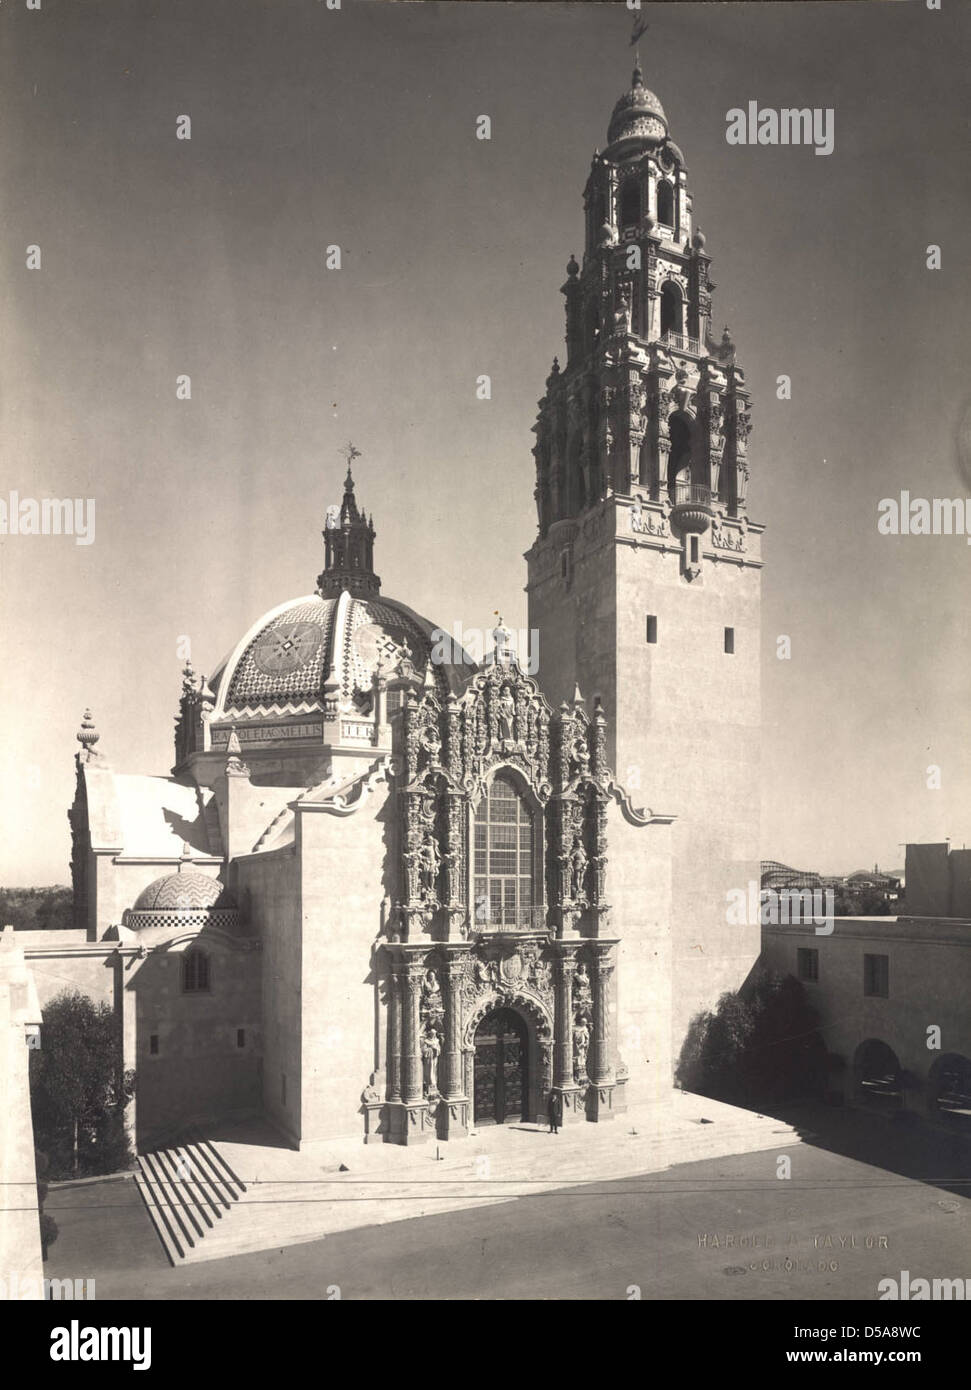 California State Building, 1915 Panama-California Exposition Stock Photo